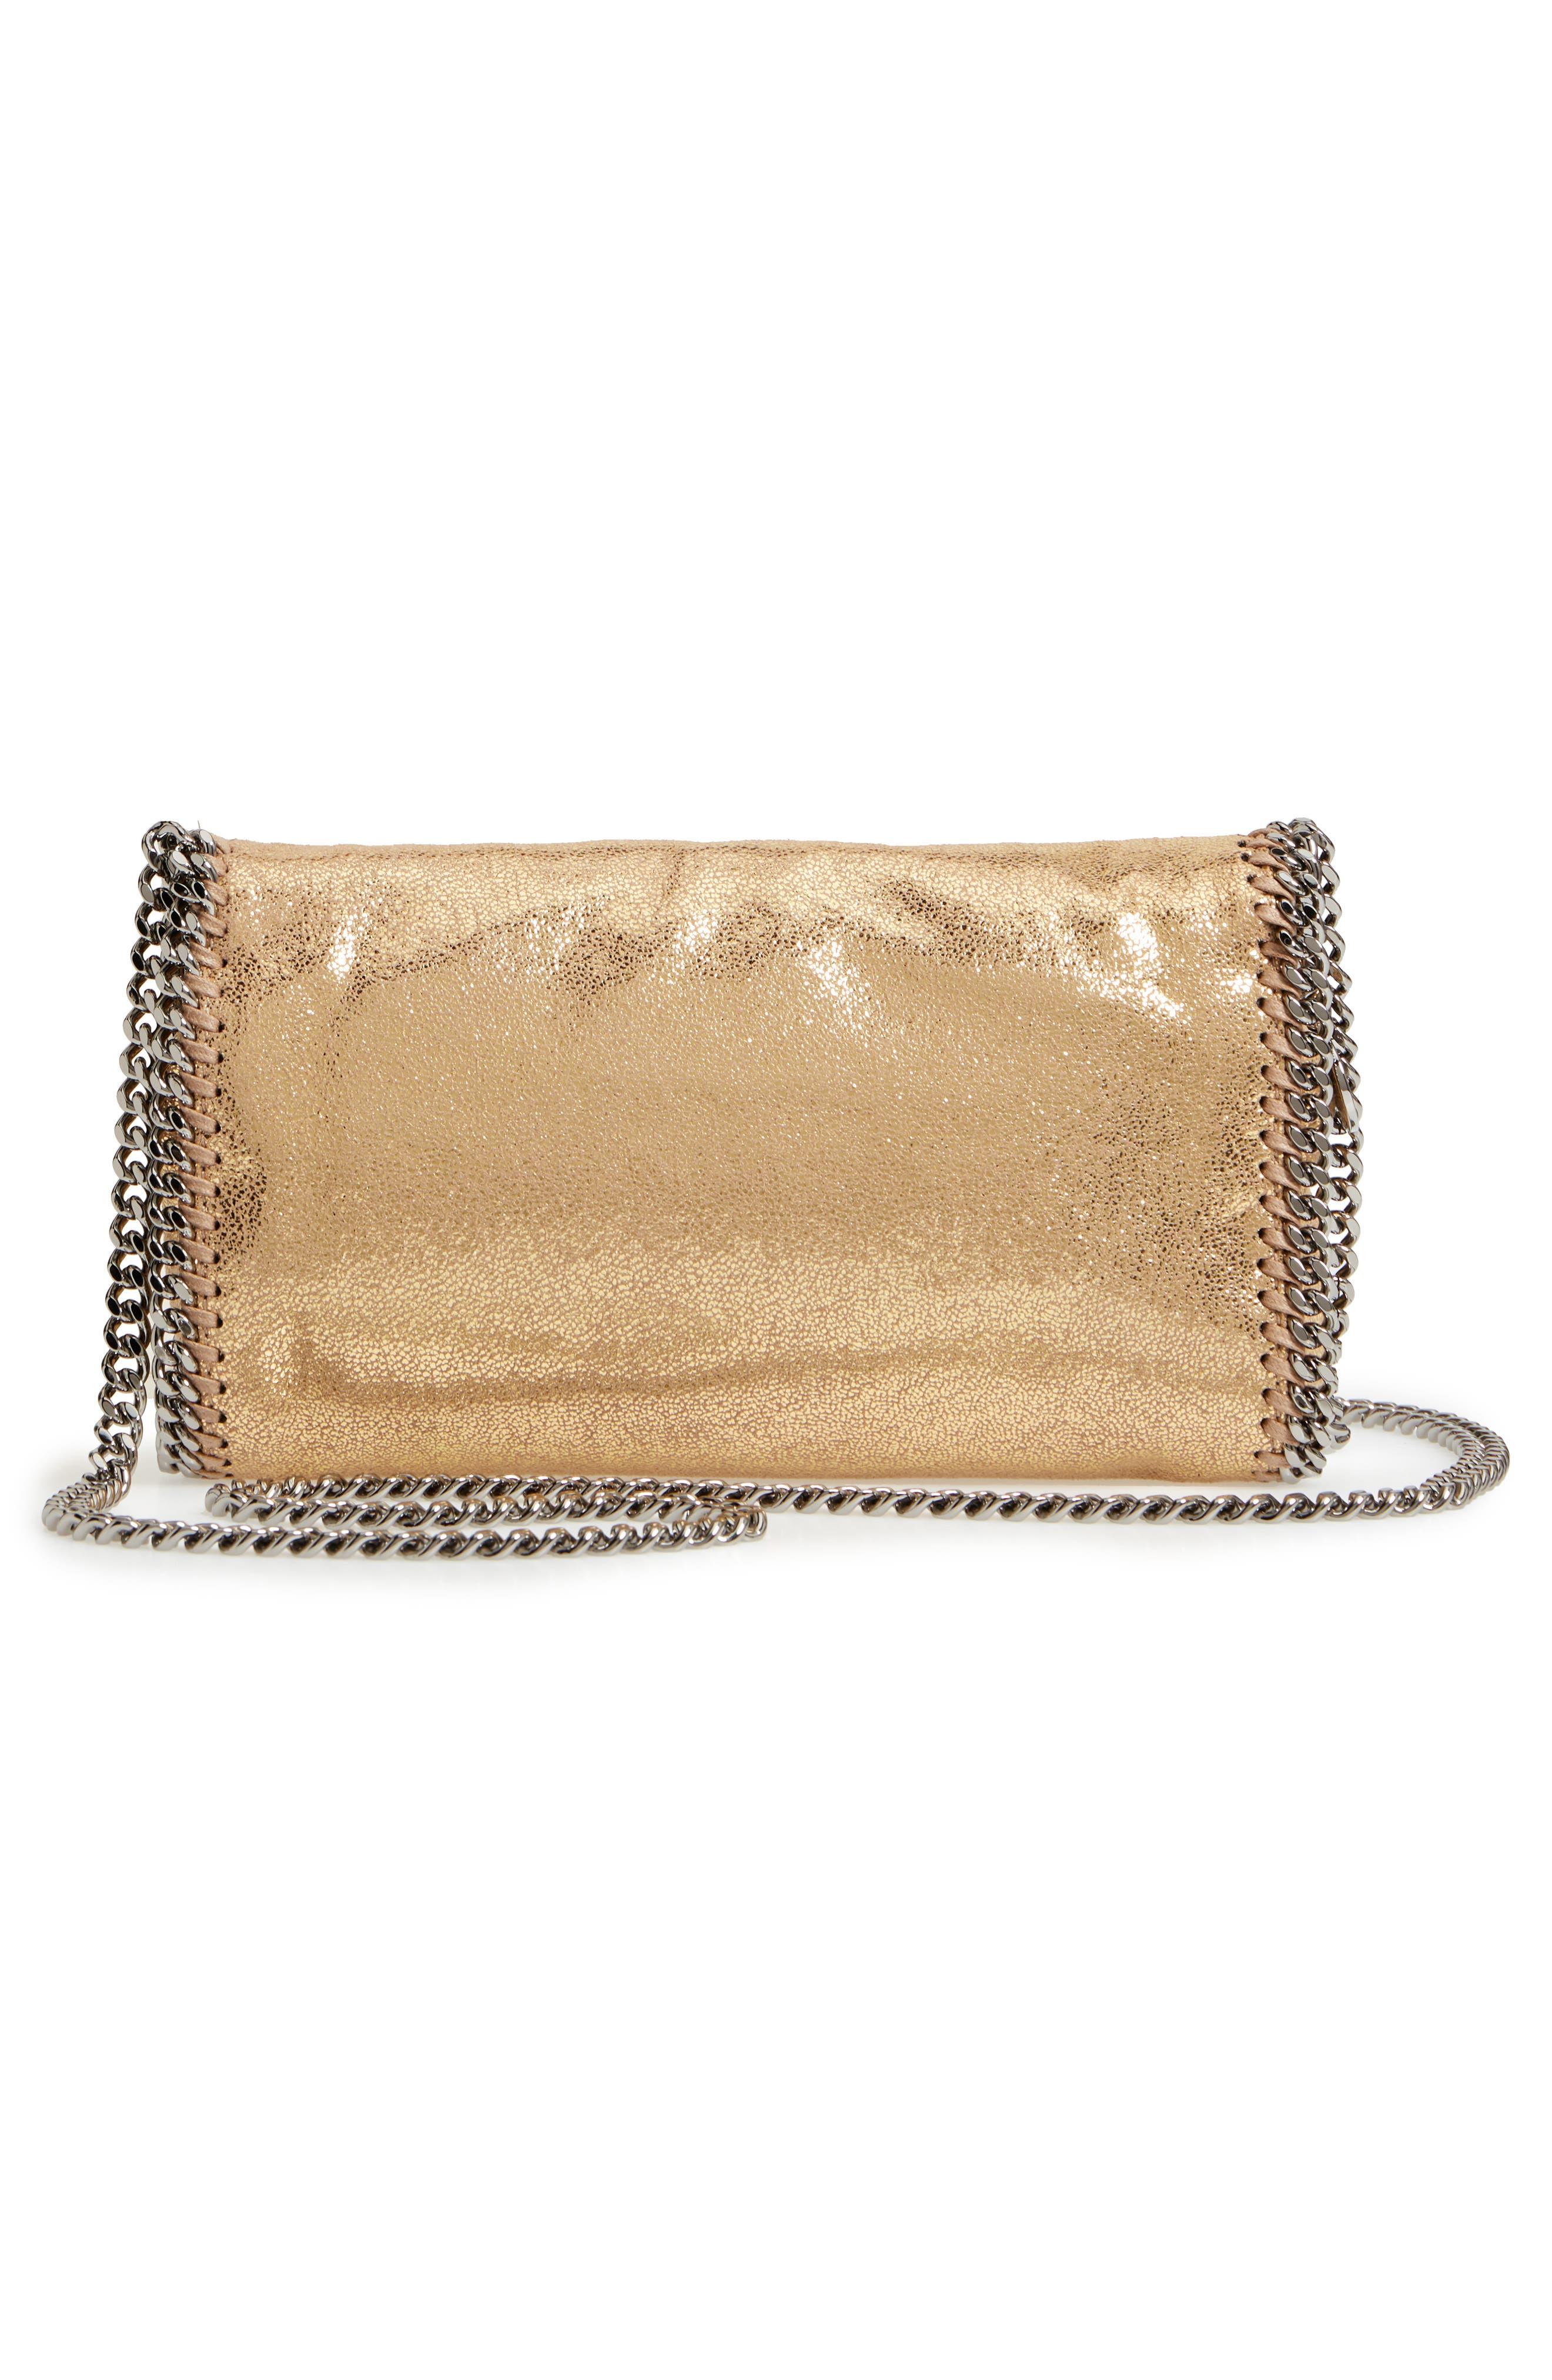 'Falabella' Crossbody Bag,                             Alternate thumbnail 3, color,                             GOLD